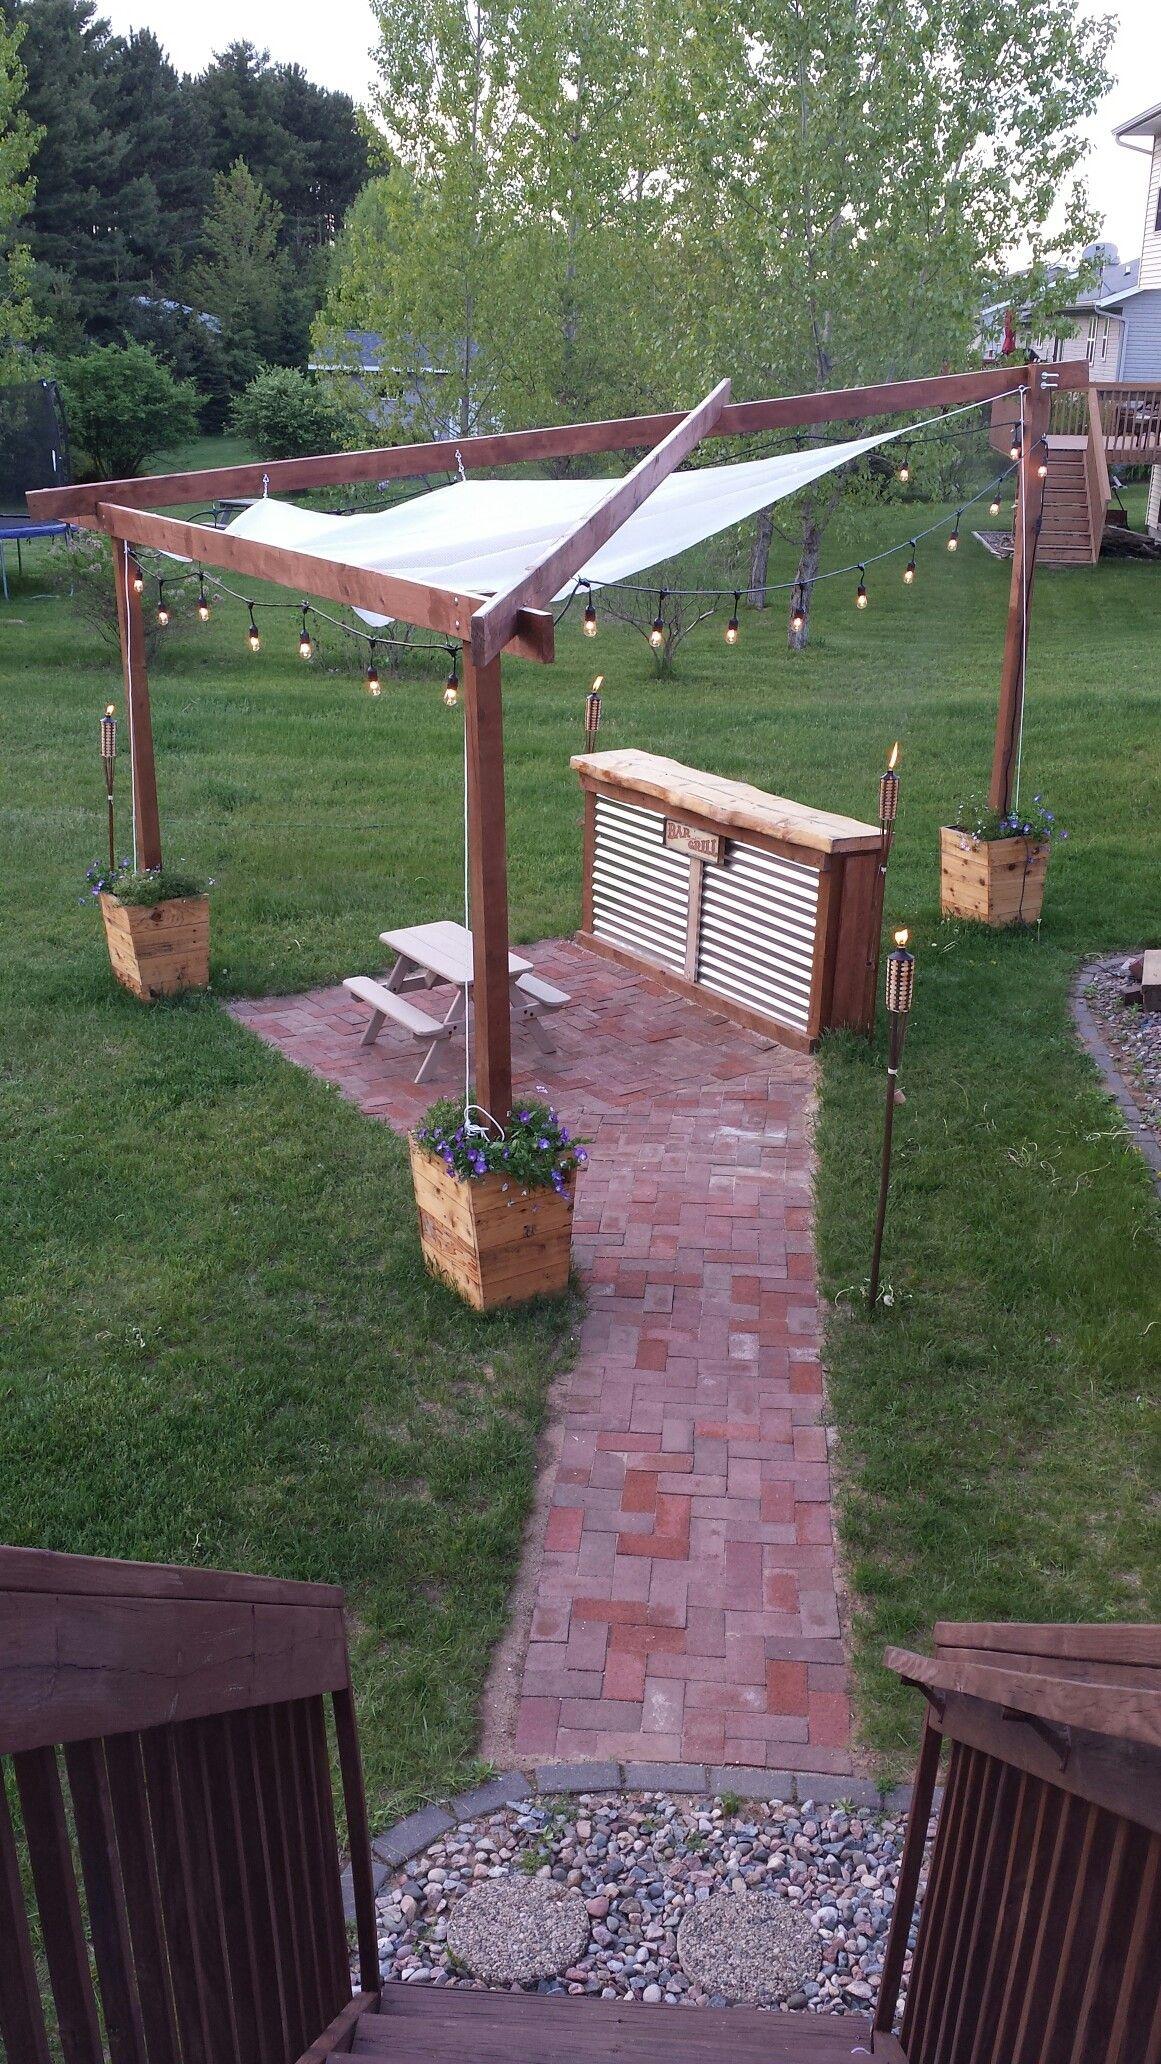 Brick patio cedar planter boxes shade sail string lights back